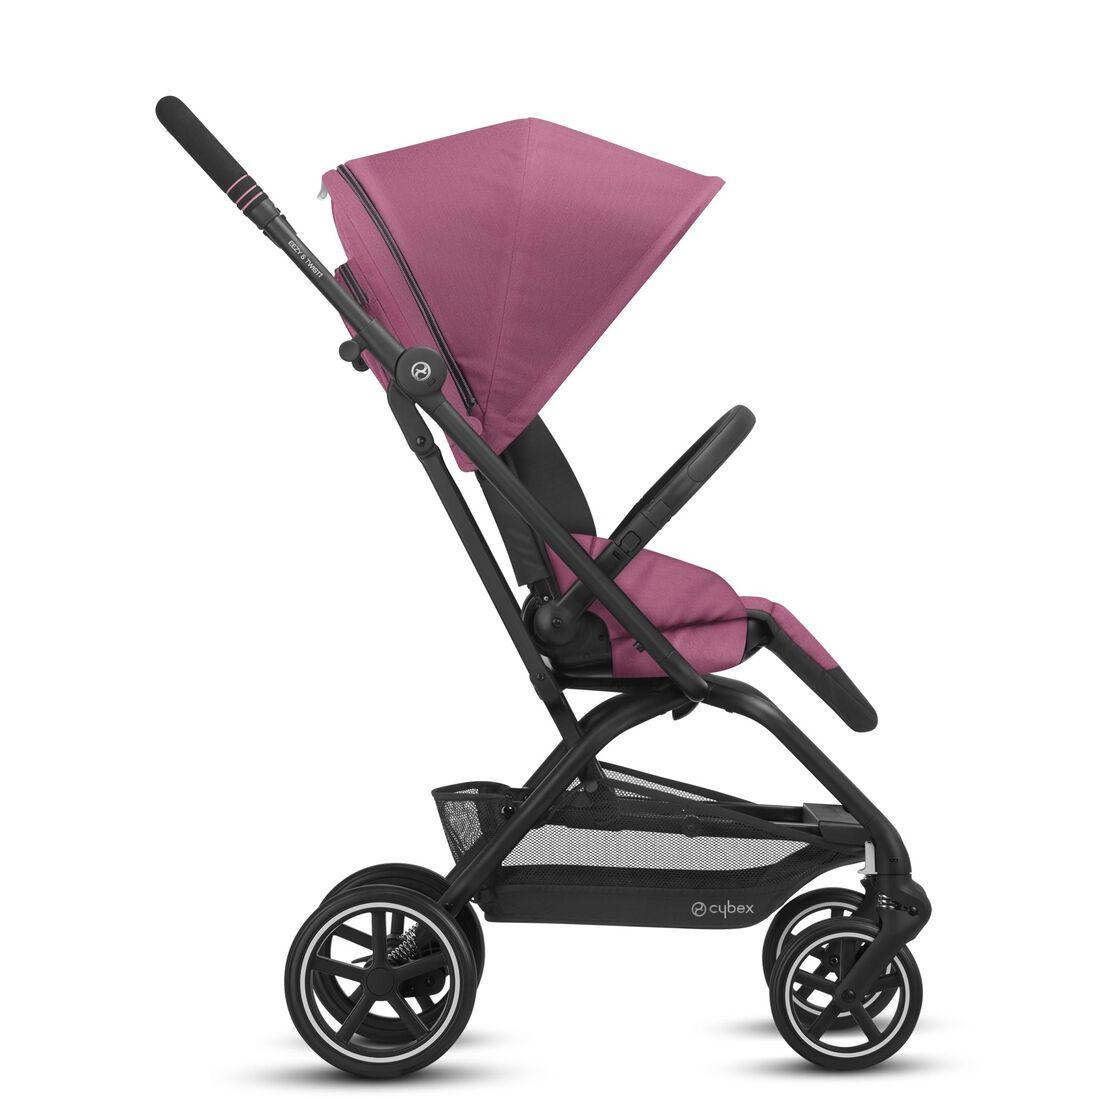 CYBEX Eezy S Twist+2 - Magnolia Pink (Schwarzer Rahmen) in Magnolia Pink (Black Frame) large Bild 2